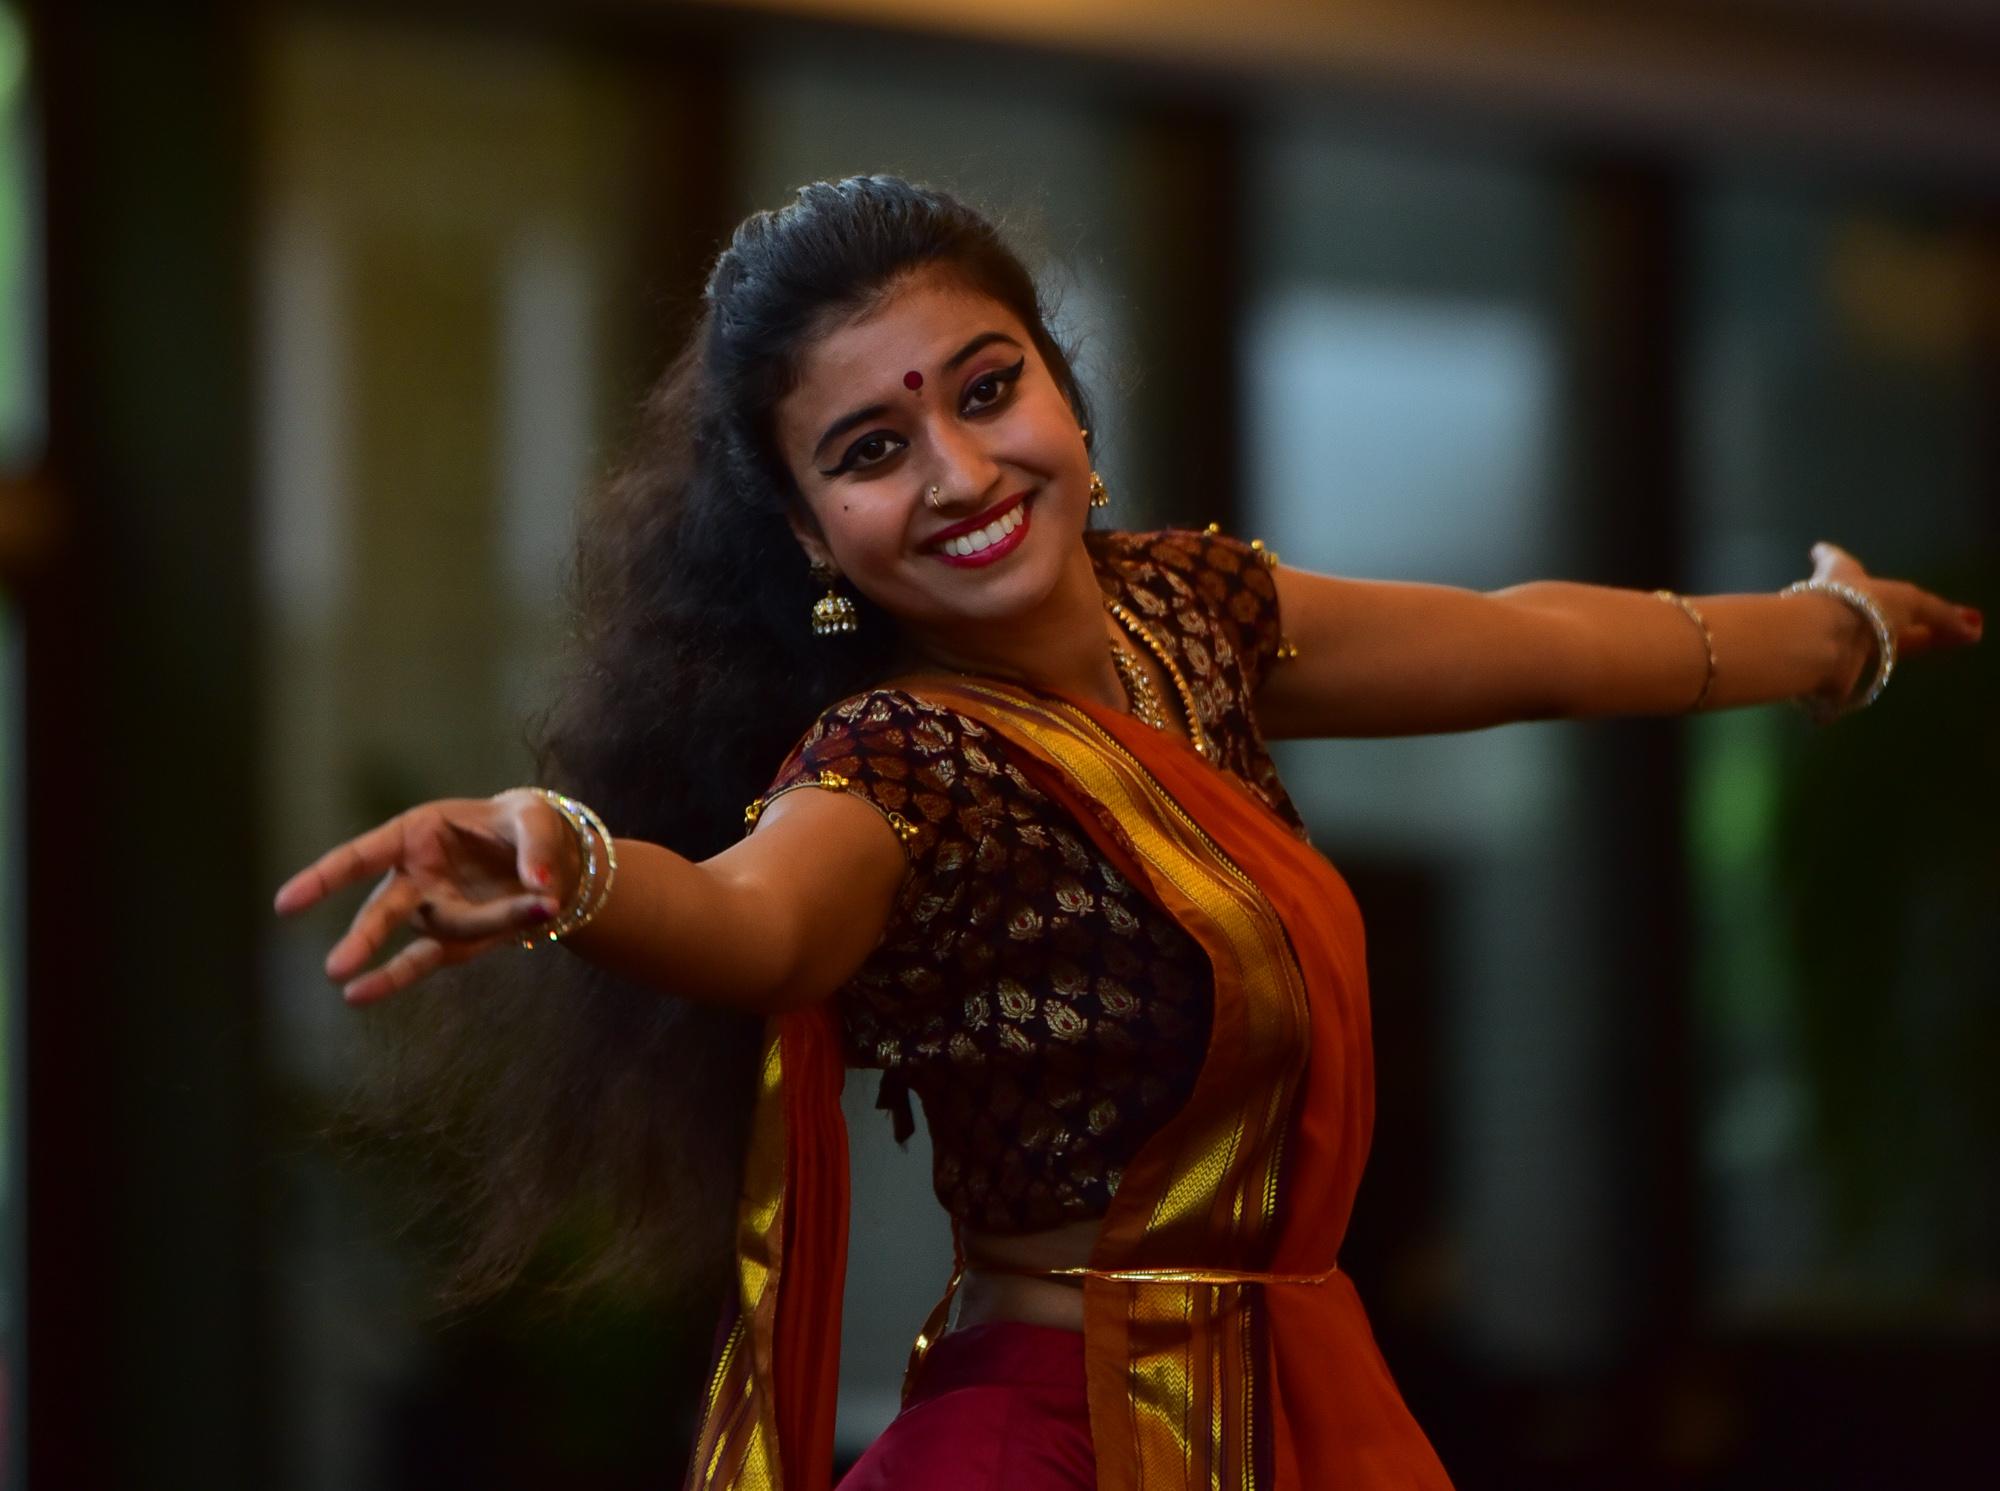 Tanzensemble Kalasri